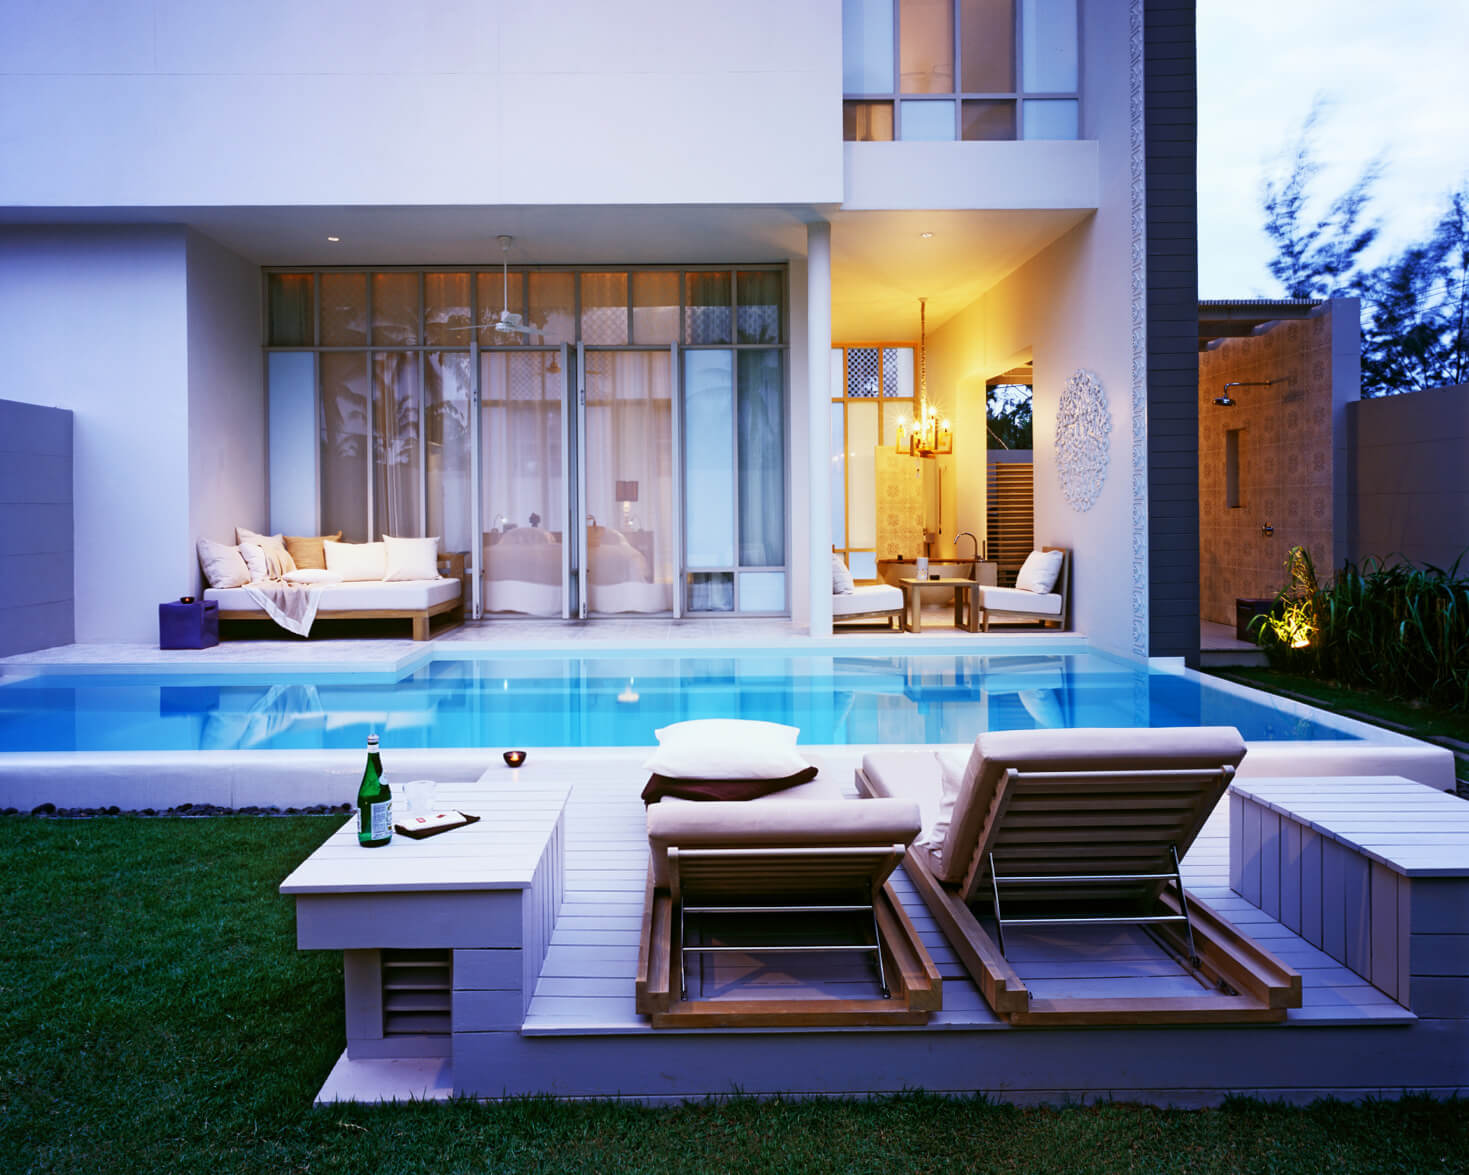 Sala phuket i luxury hotel beach front villas for Garden pool villa